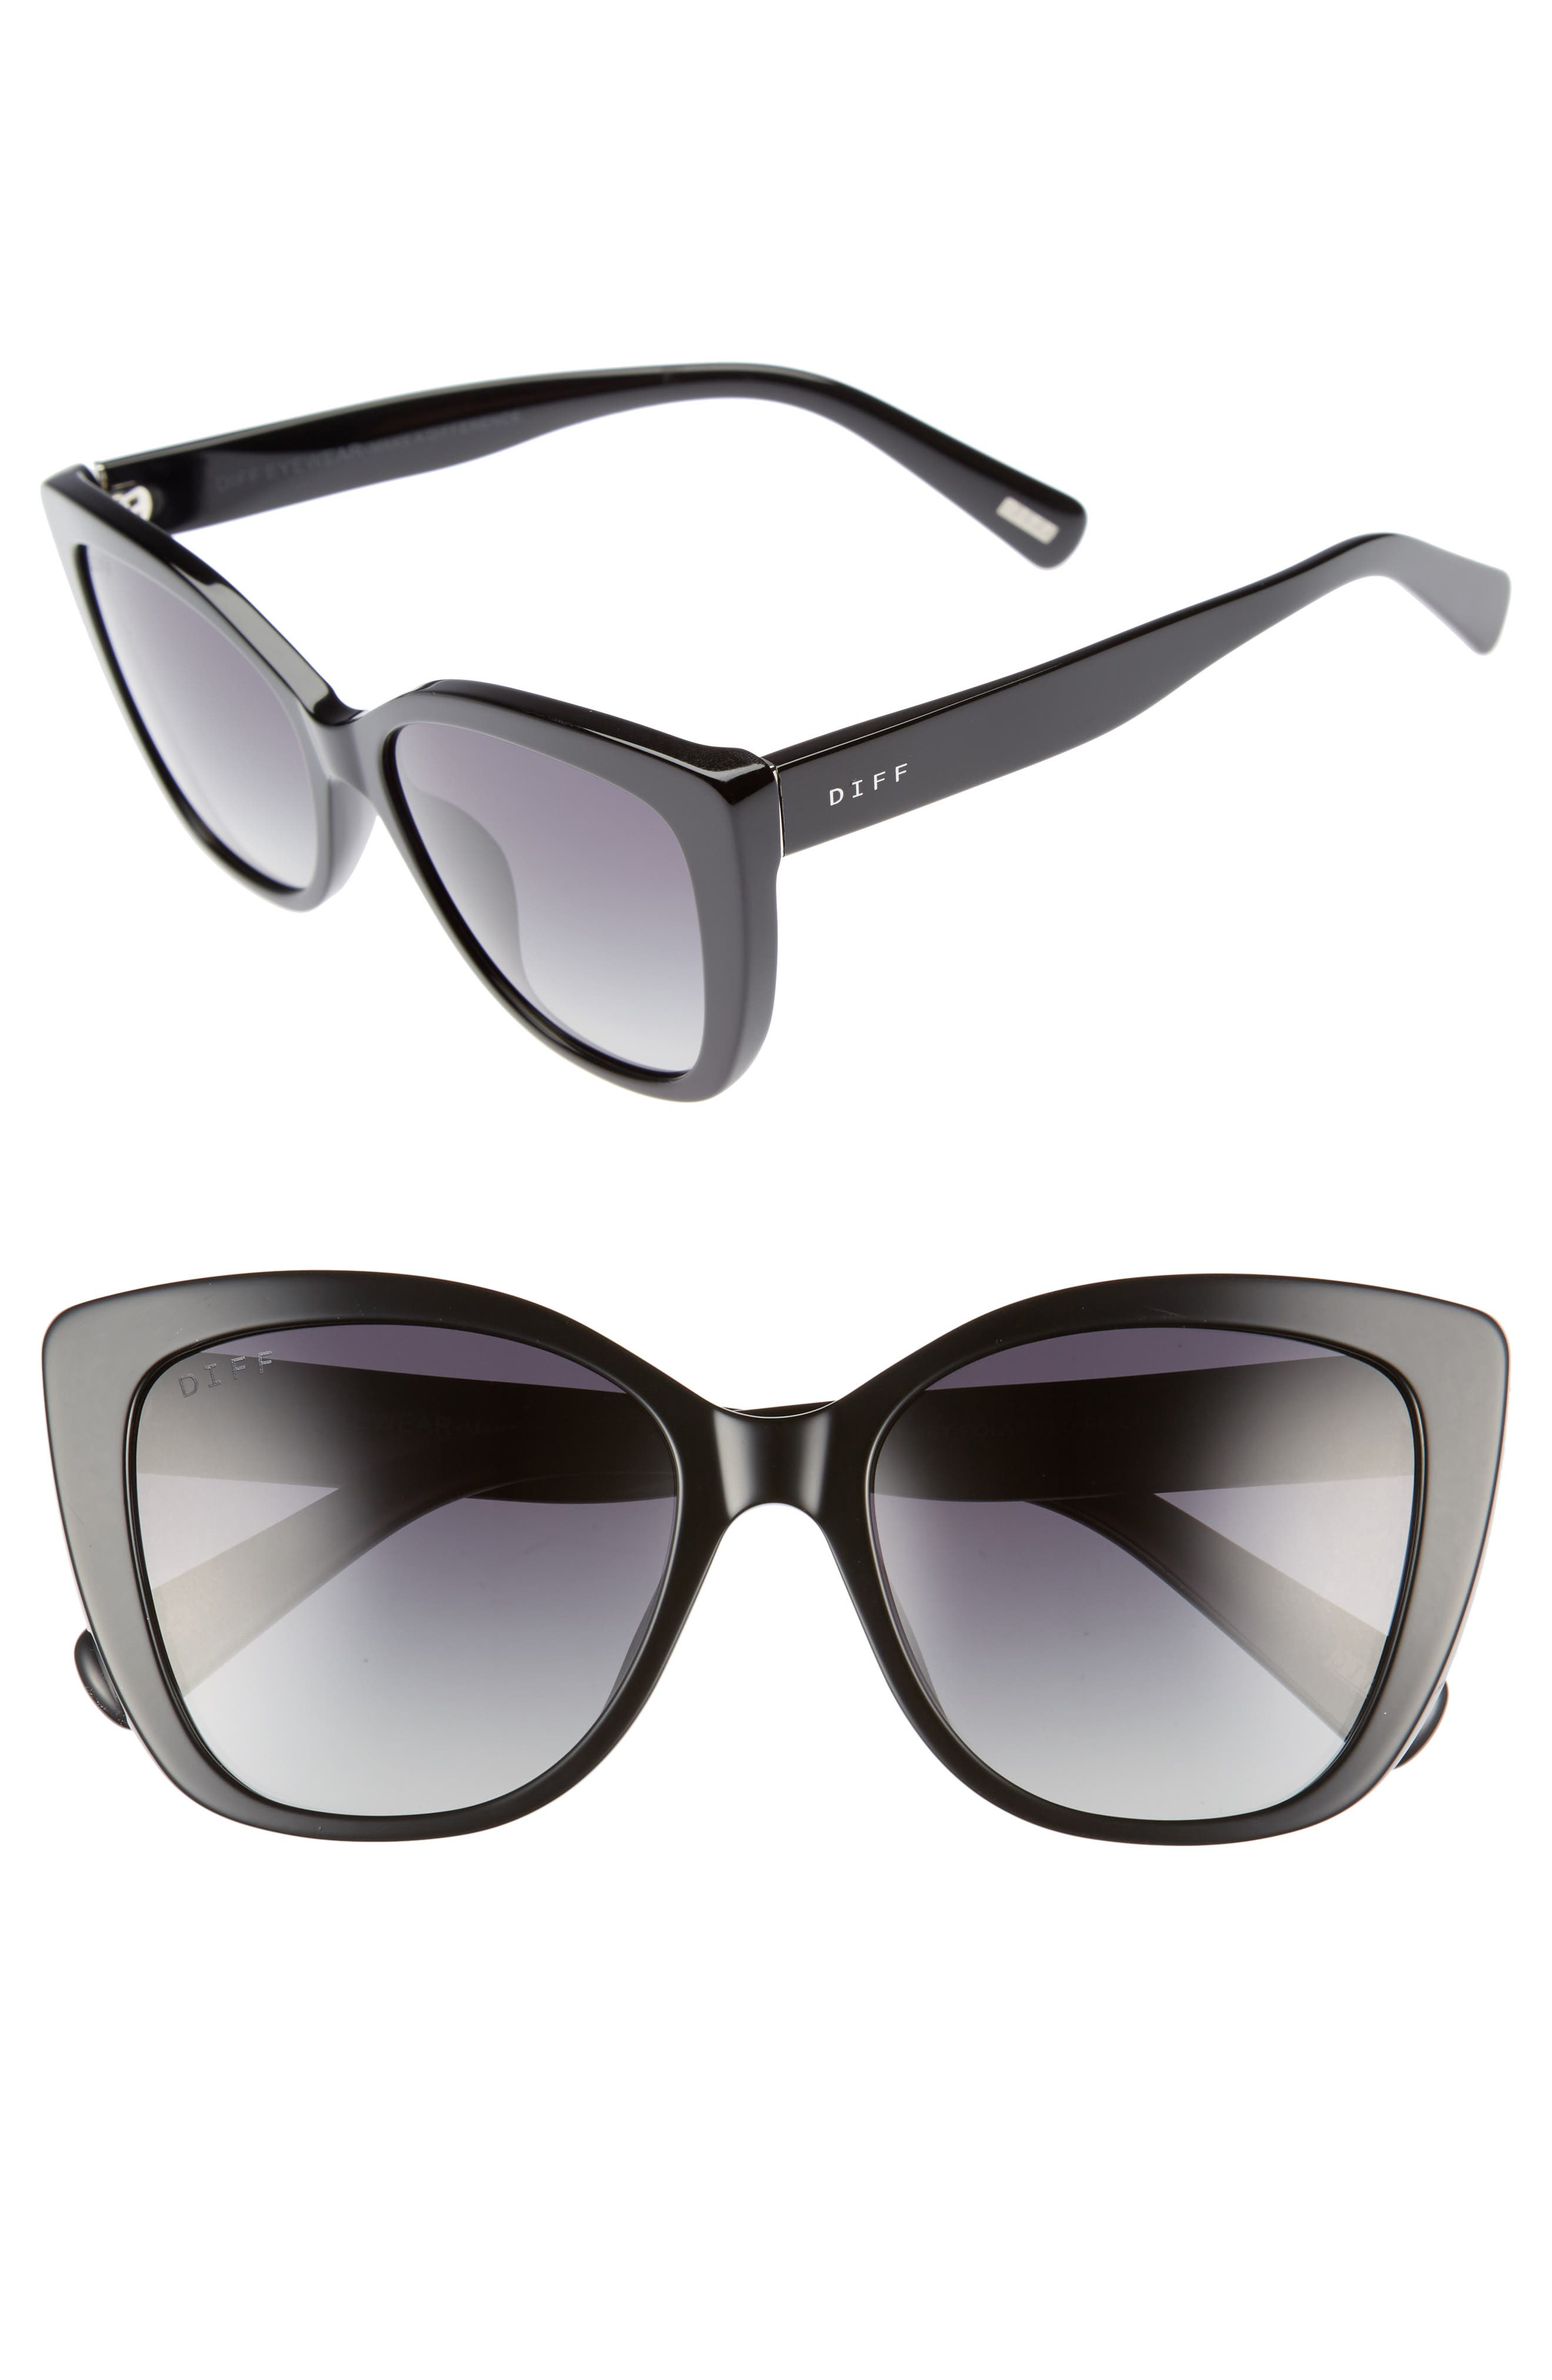 Ruby 54mm Polarized Sunglasses,                             Main thumbnail 1, color,                             Black/ Grey